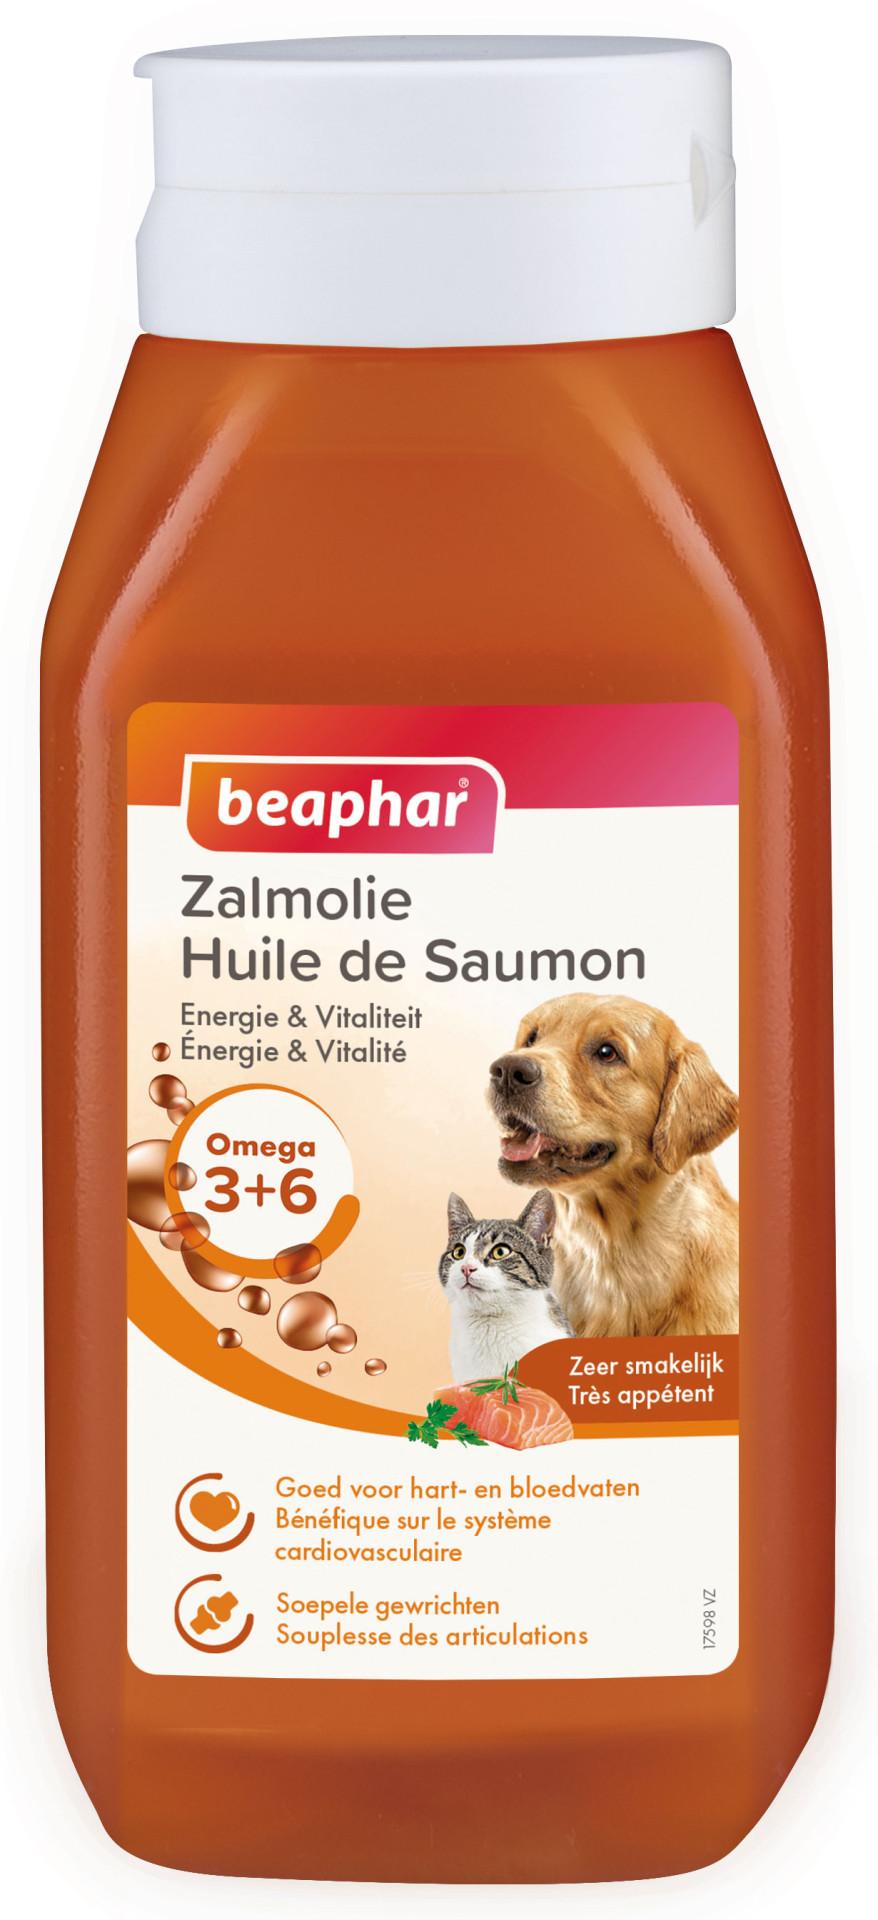 Beaphar Zalmolie<br>430 ml